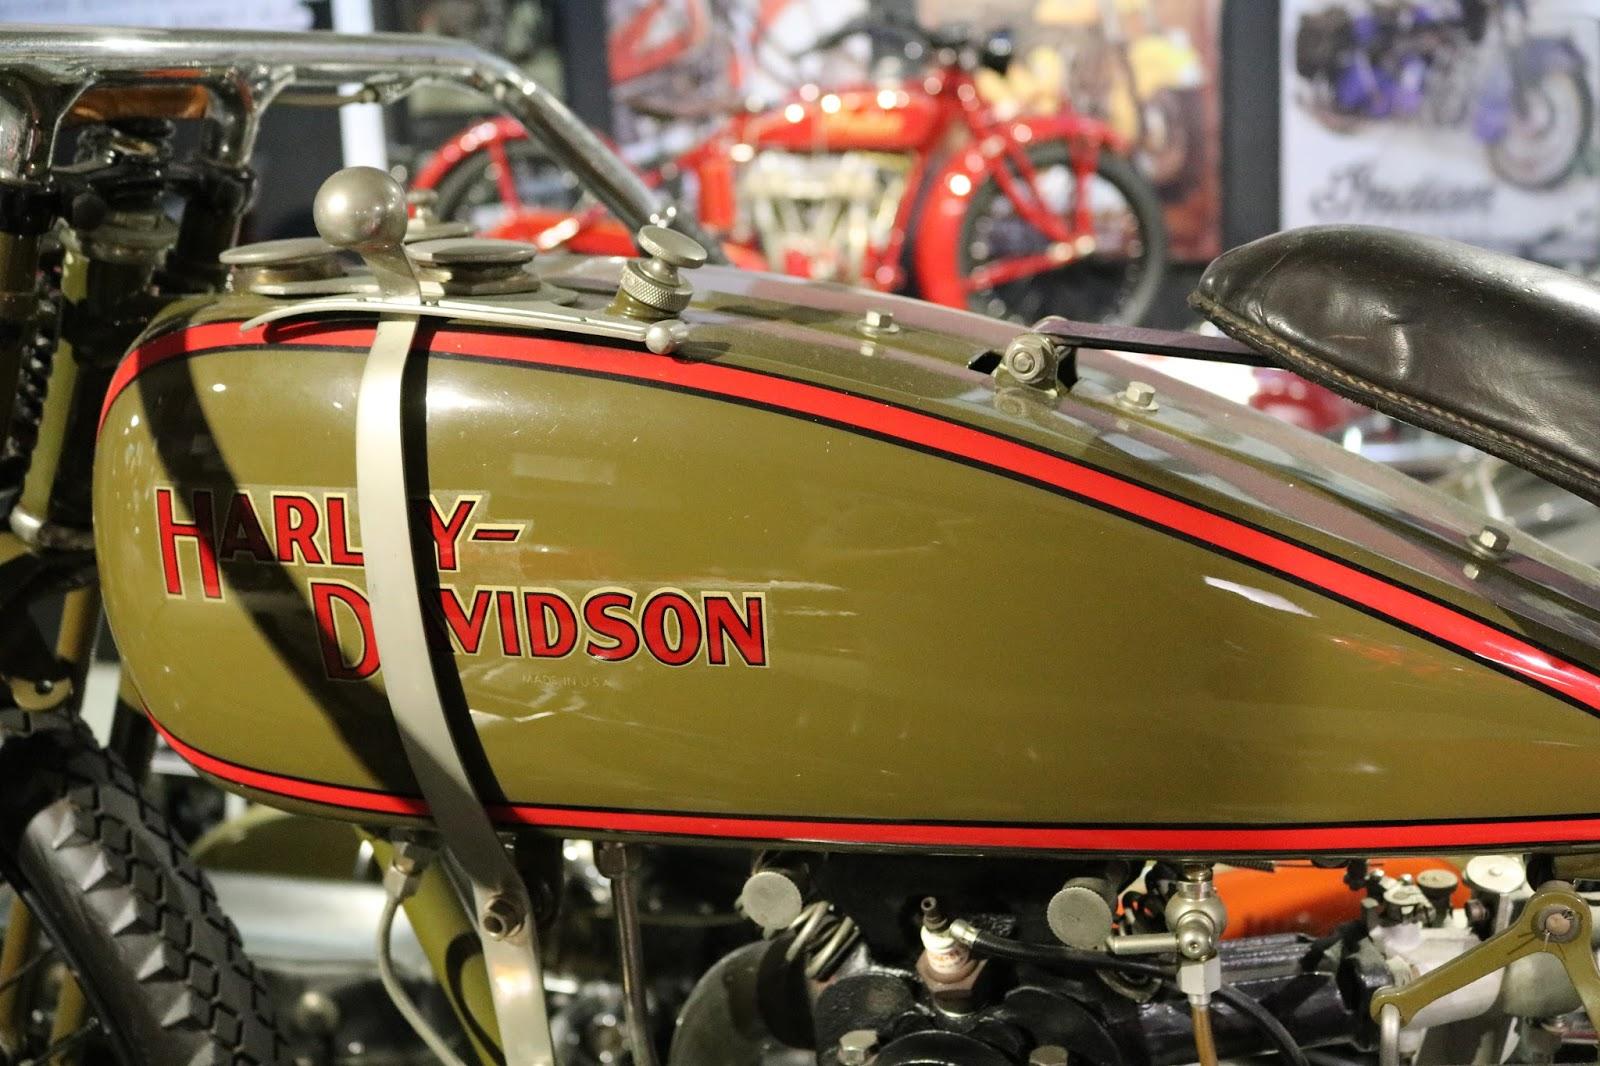 1926 Harley Davidson Peashooter: OldMotoDude: 1926 Harley-Davidson Model A Peashooter On